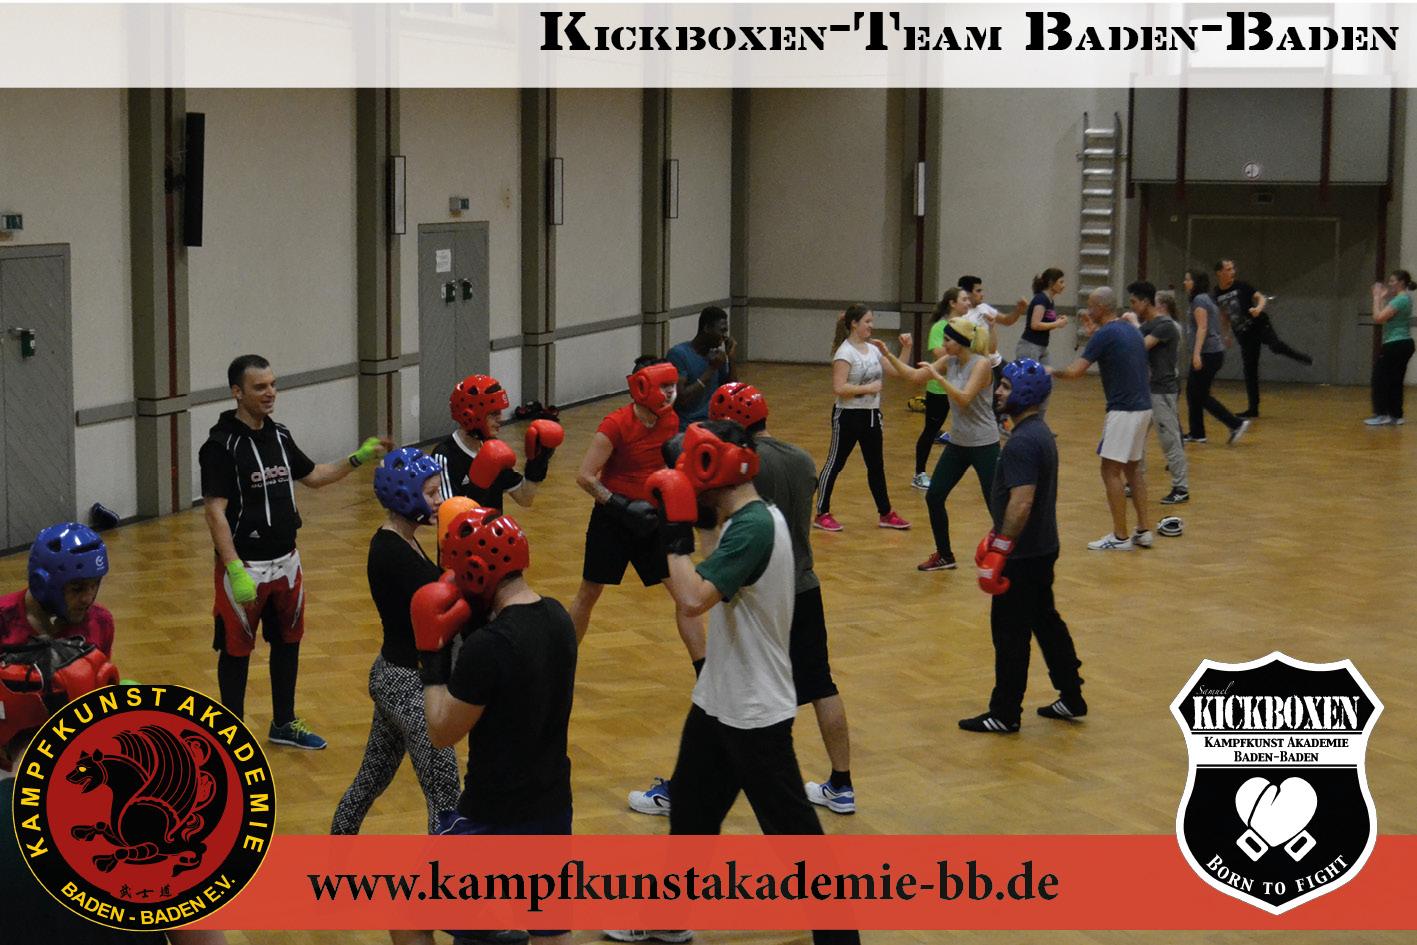 Kickbox Baden-Baden